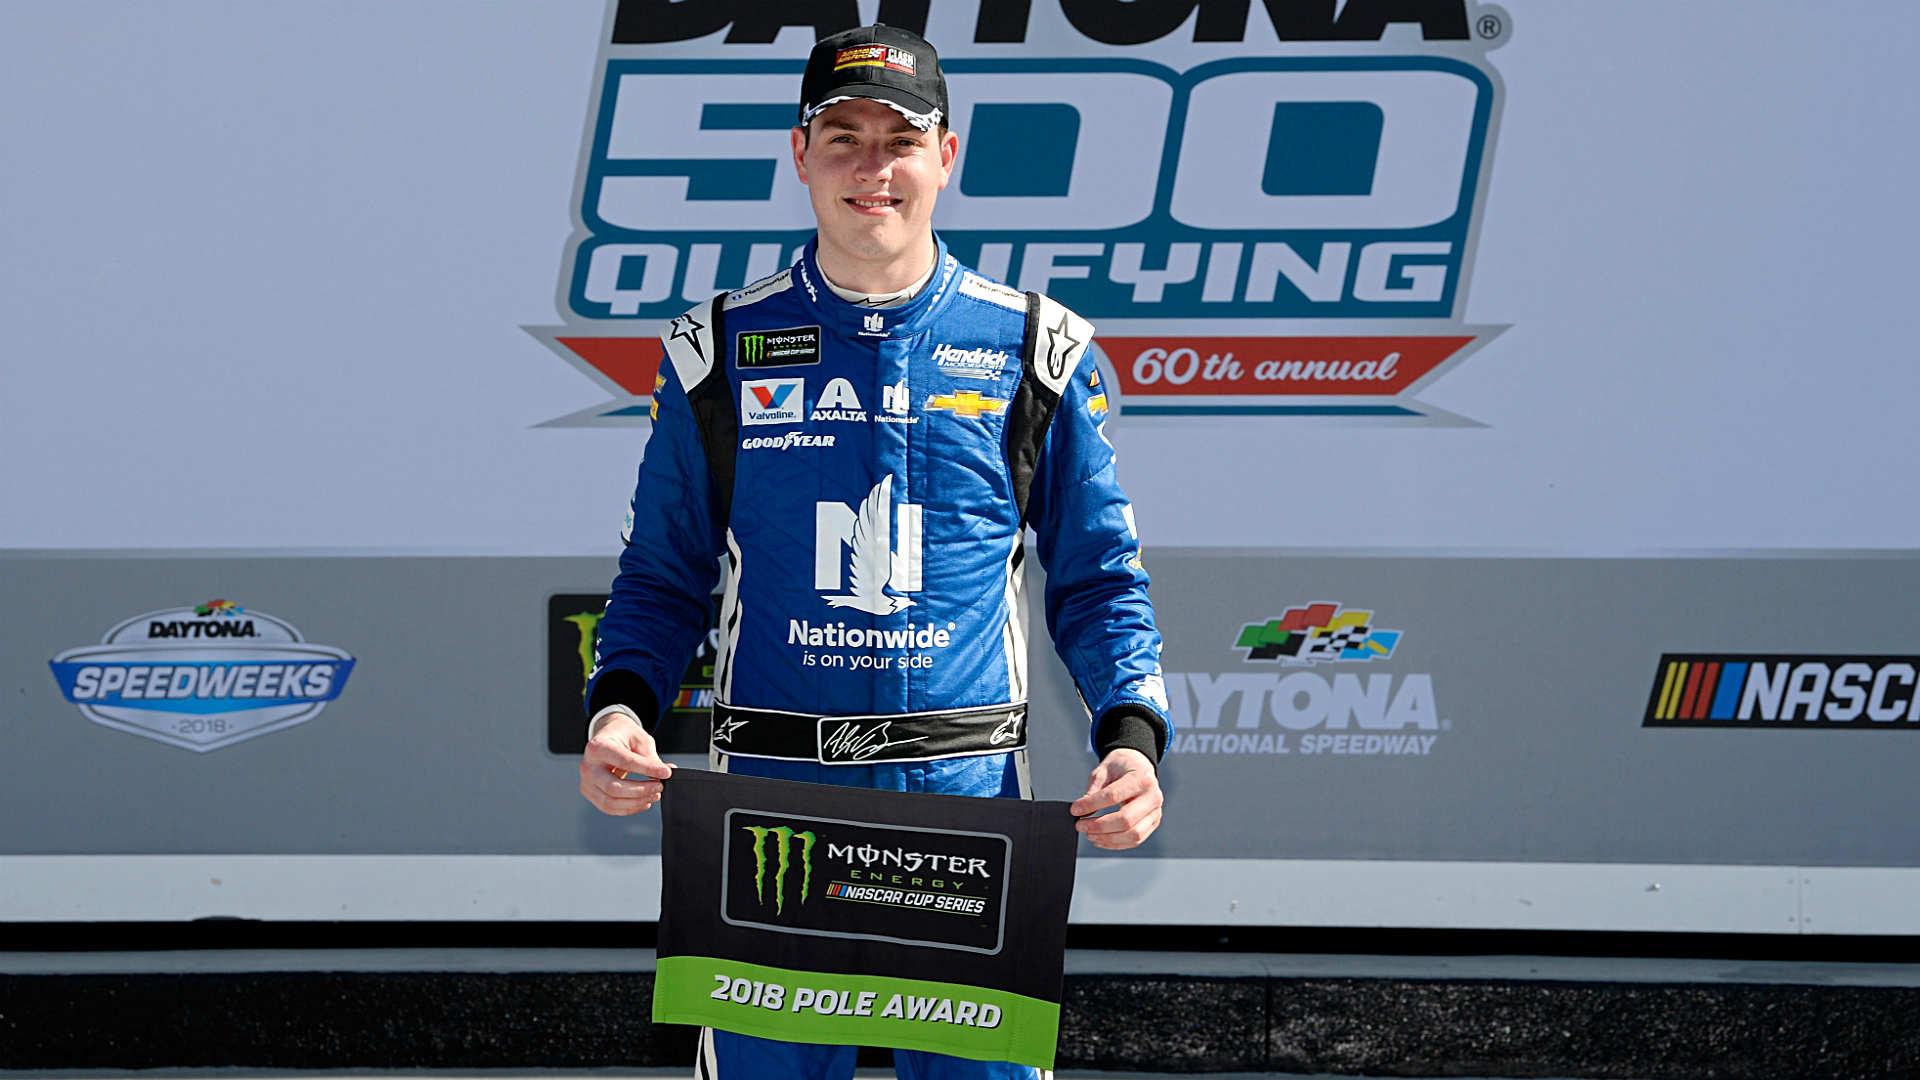 Daytona 500: Alex Bowman making name for himself as he succeeds Dale Jr.